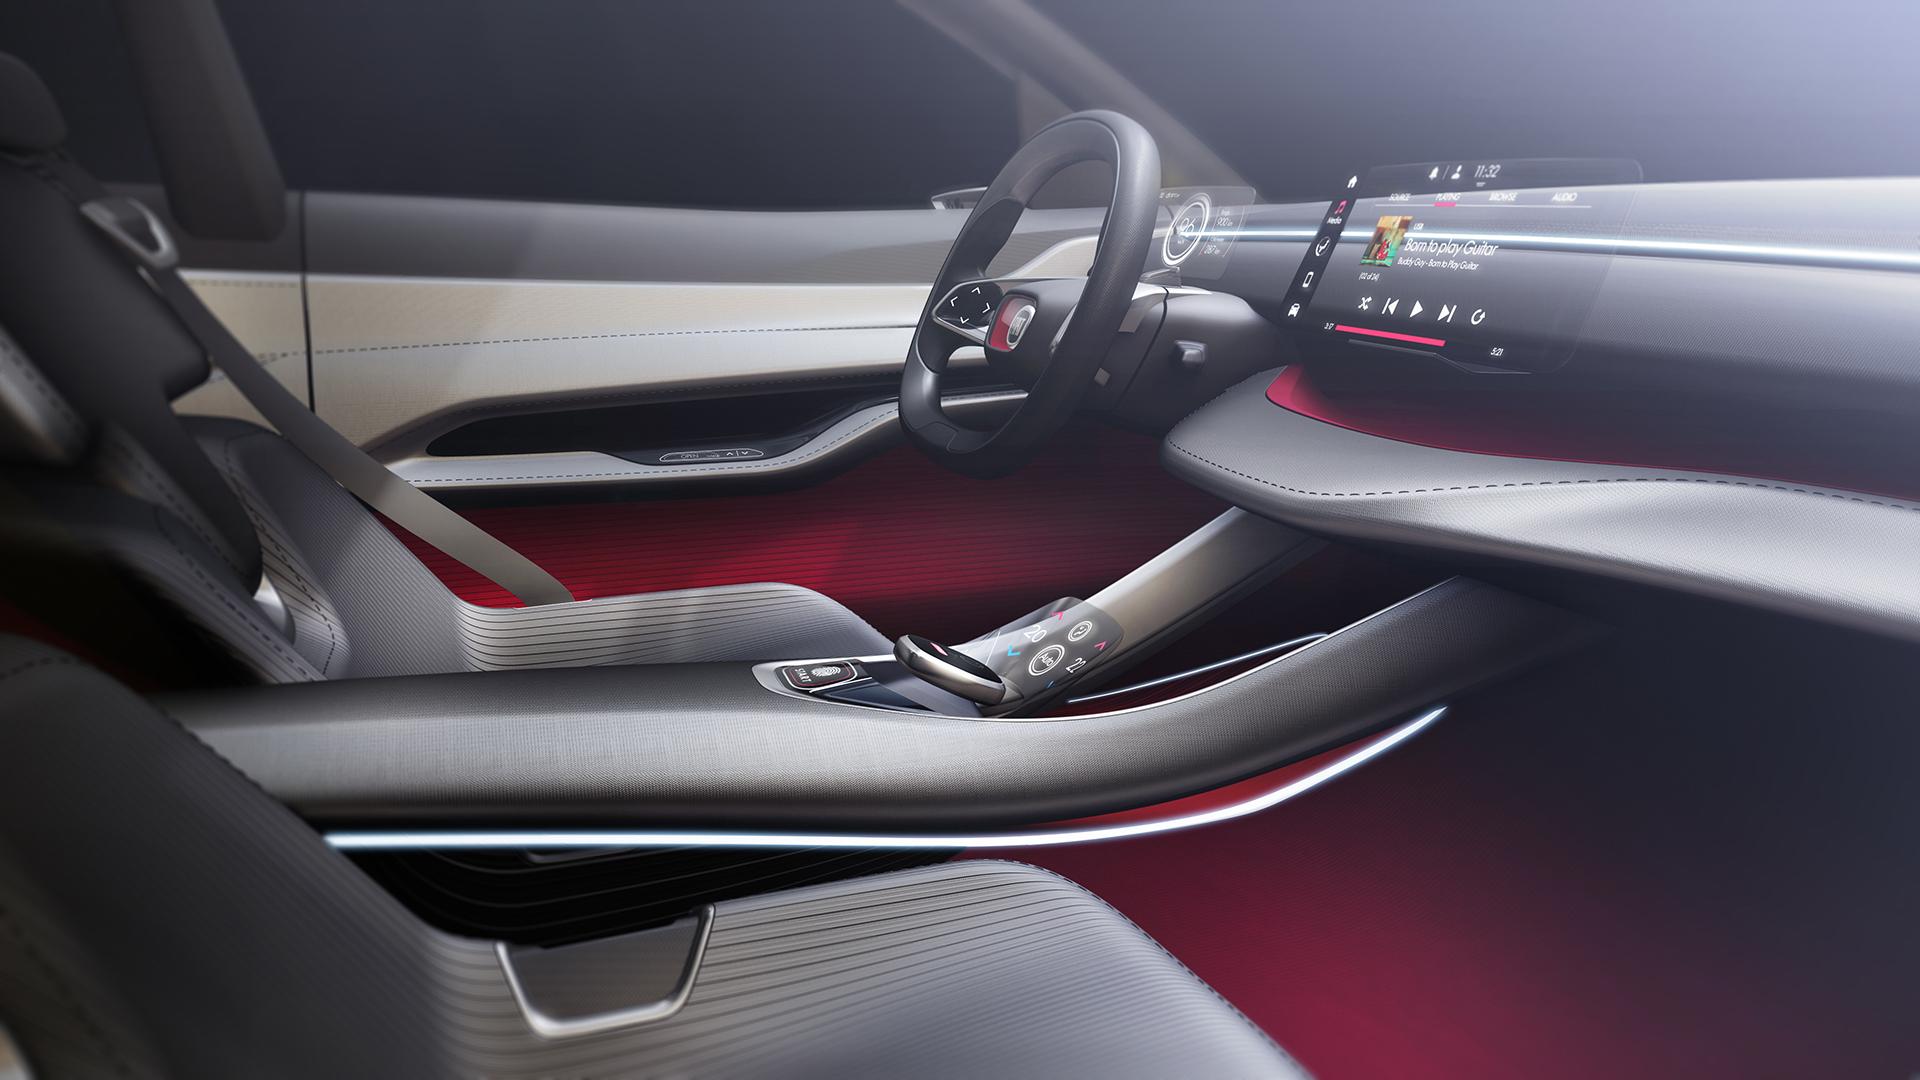 2018 Fiat Fastback Concepts